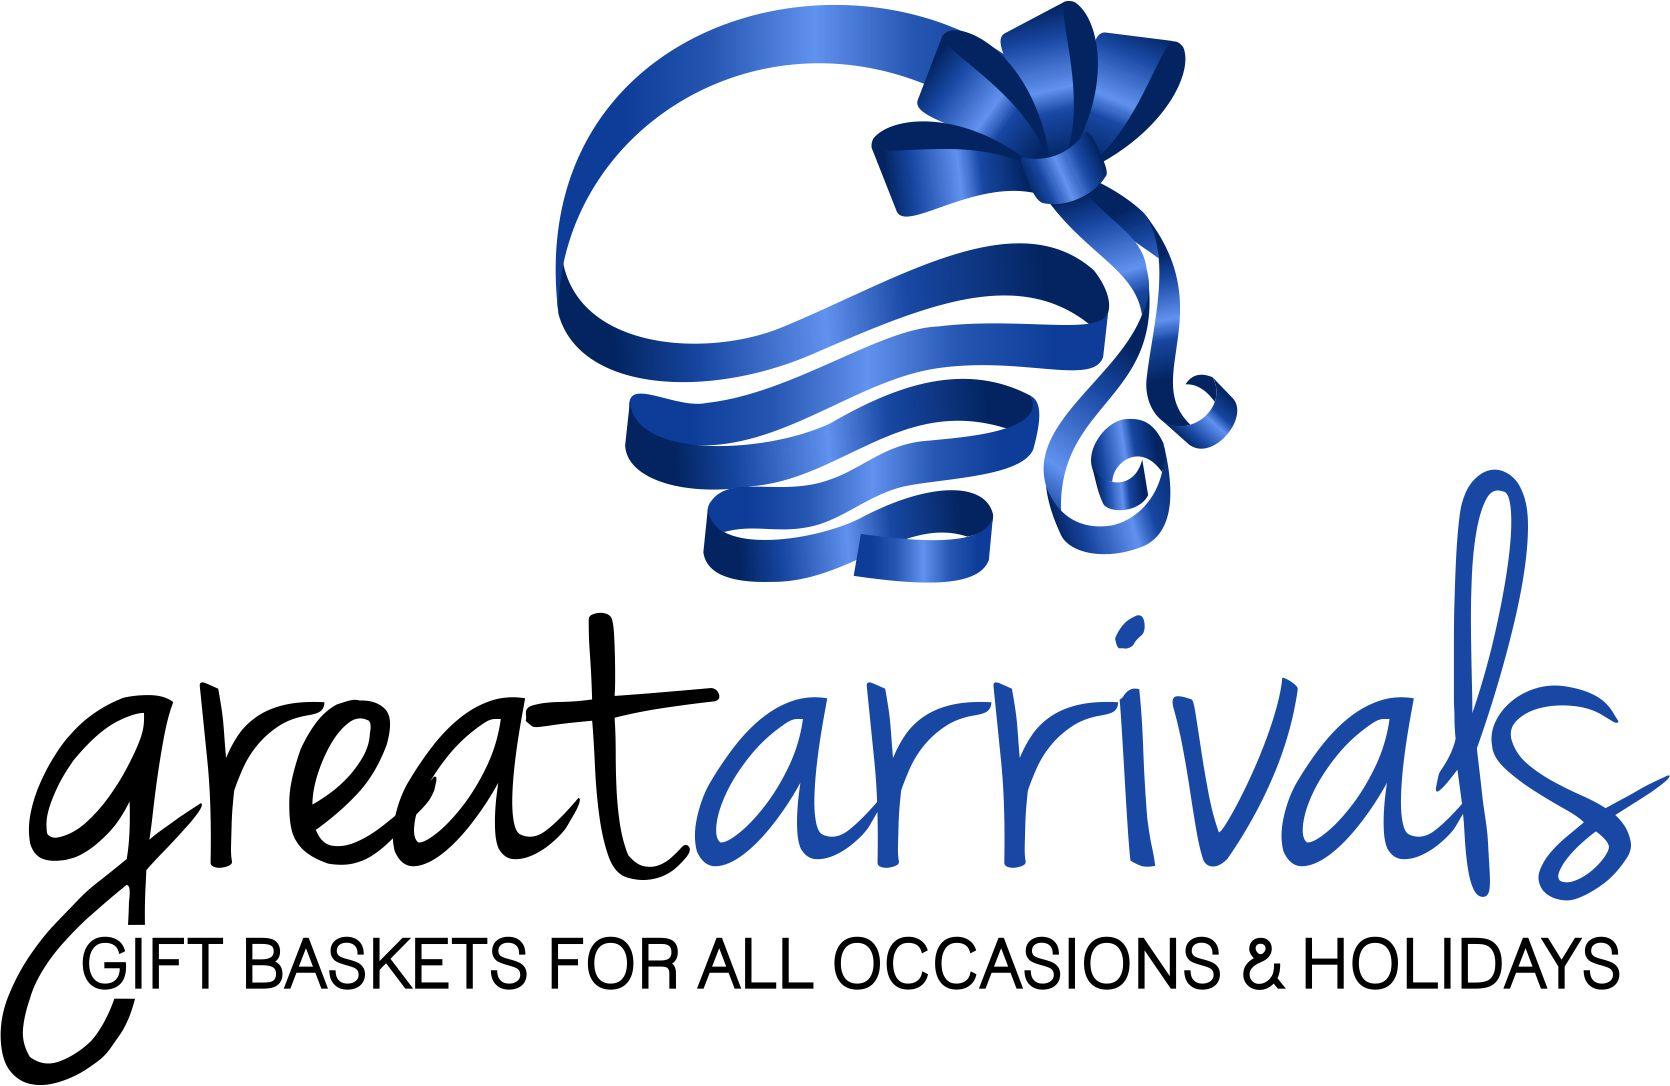 GreatArrivals